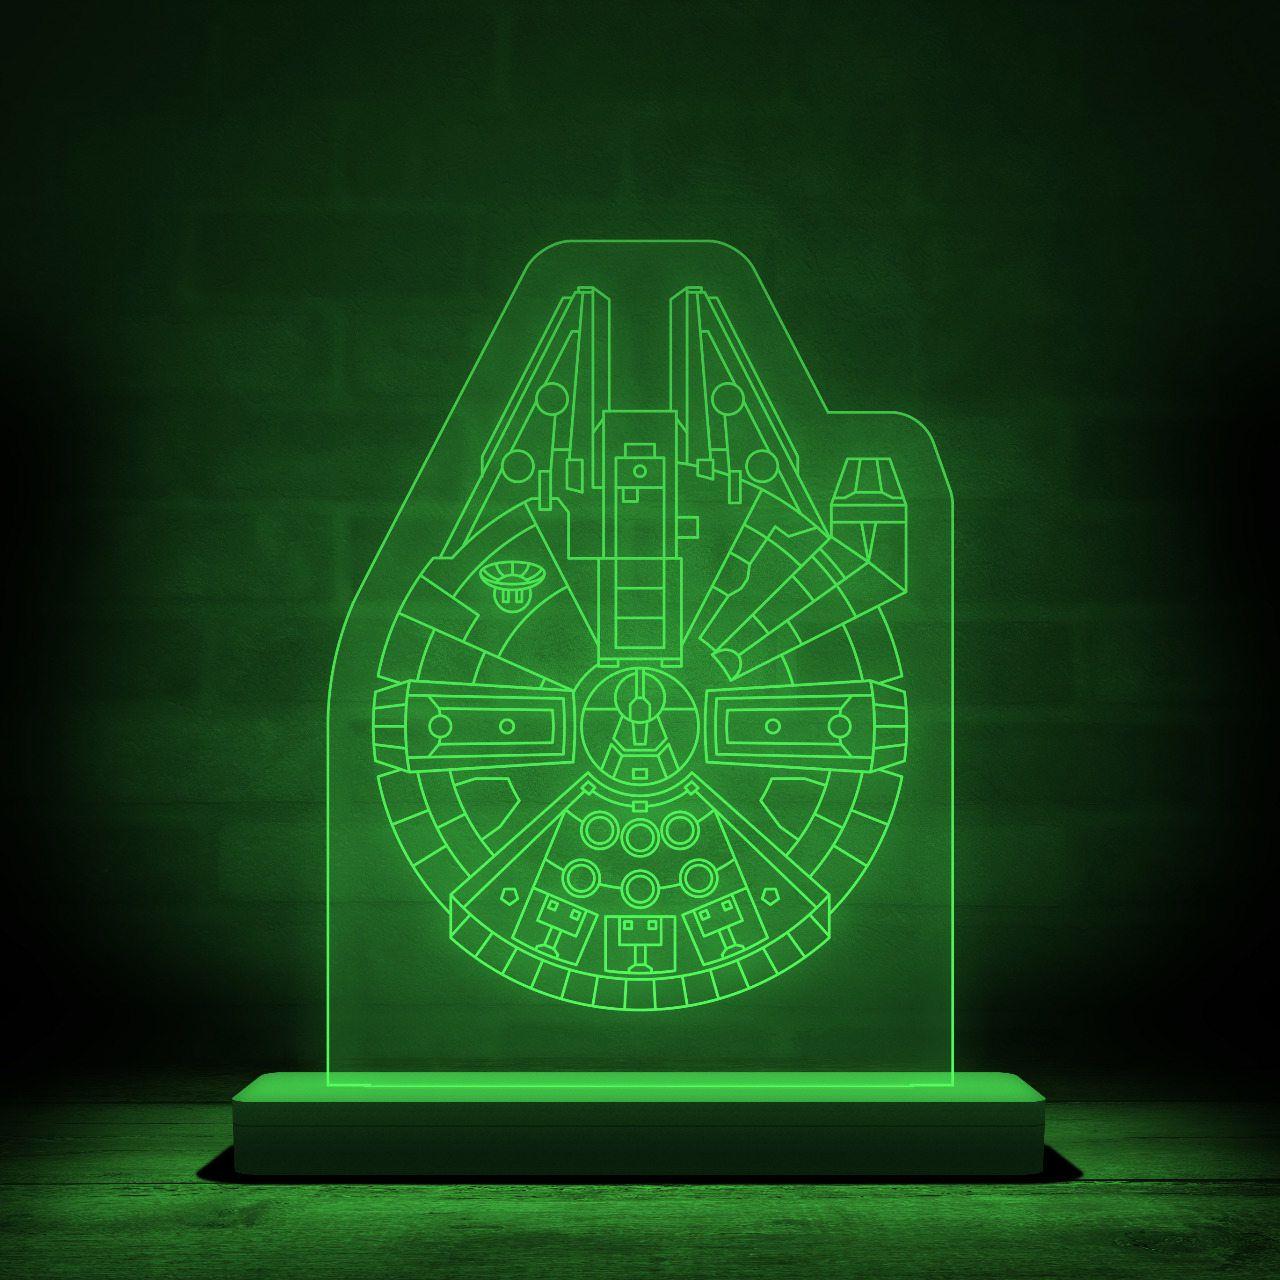 Luminária/Abajur Millennium Falcon: Star Wars - EV